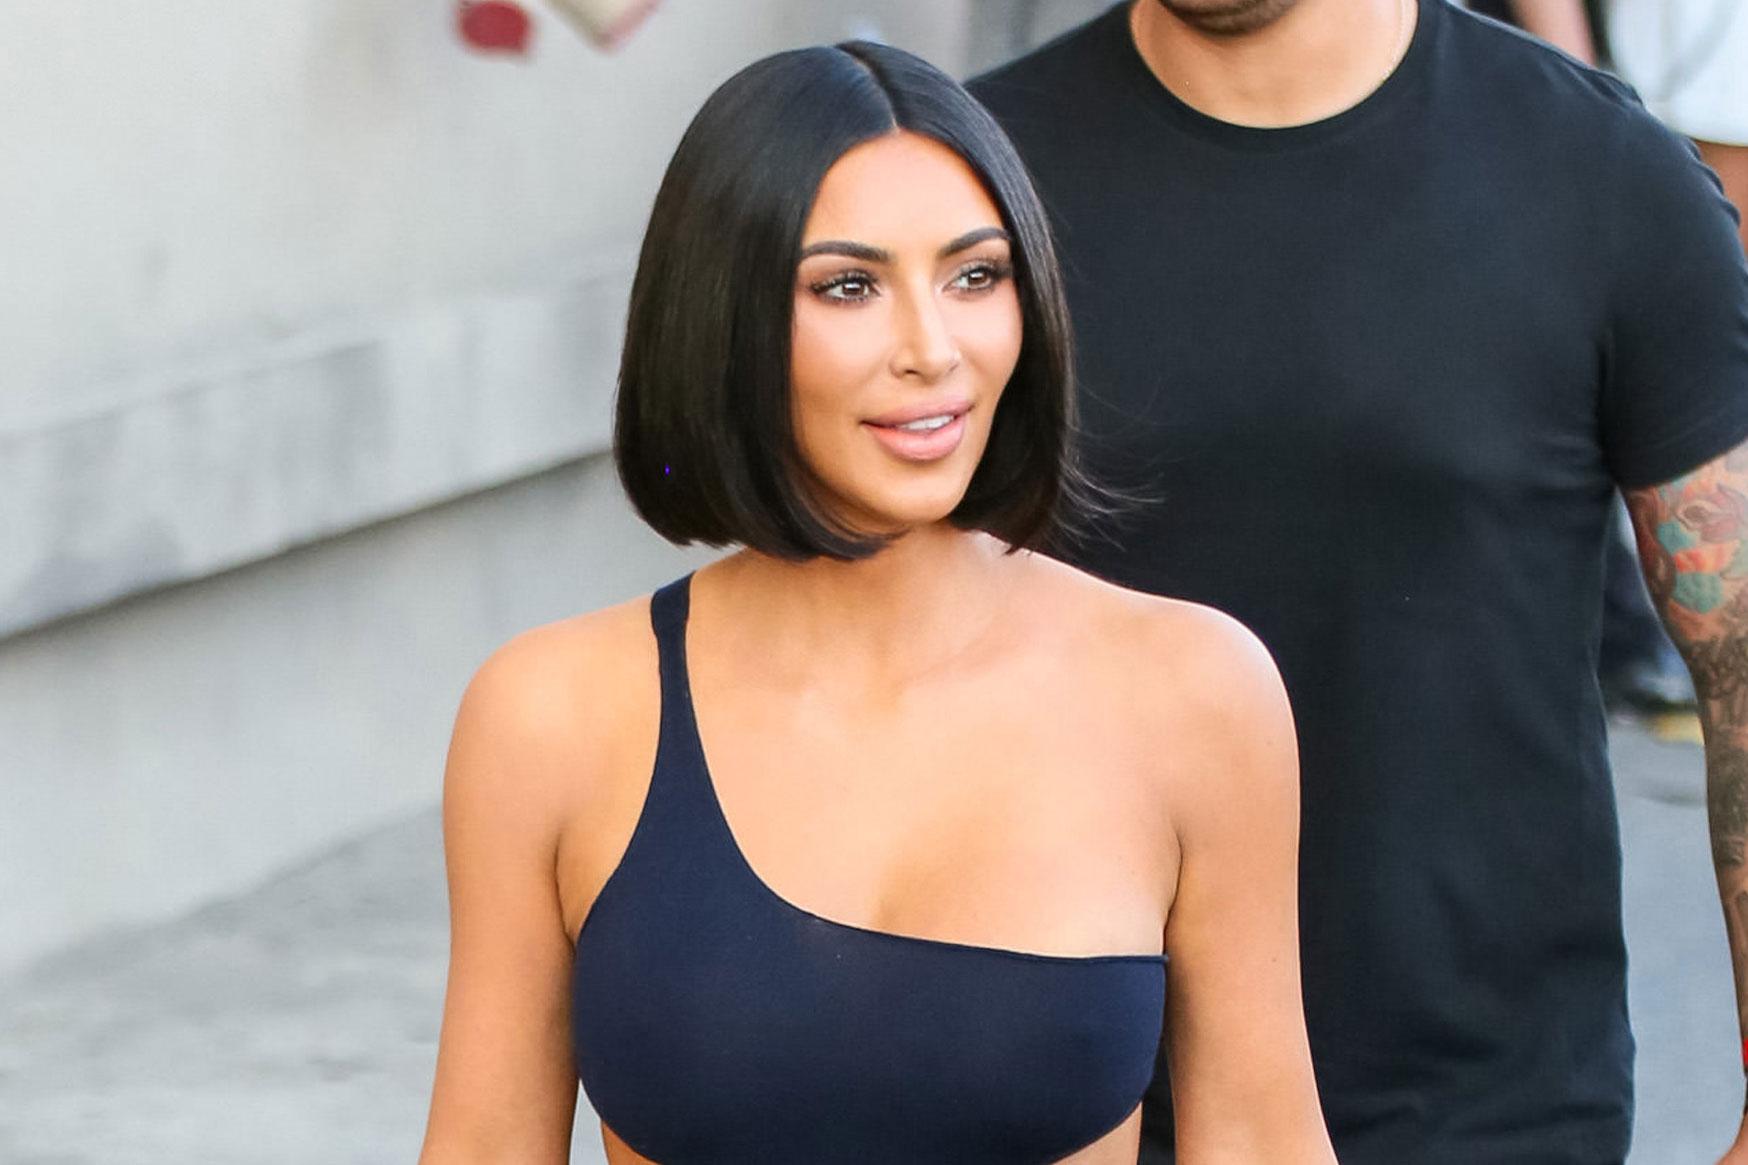 KUWK Kim Kardashian Says She U2019s U2018Stressing U2019 Out Waiting